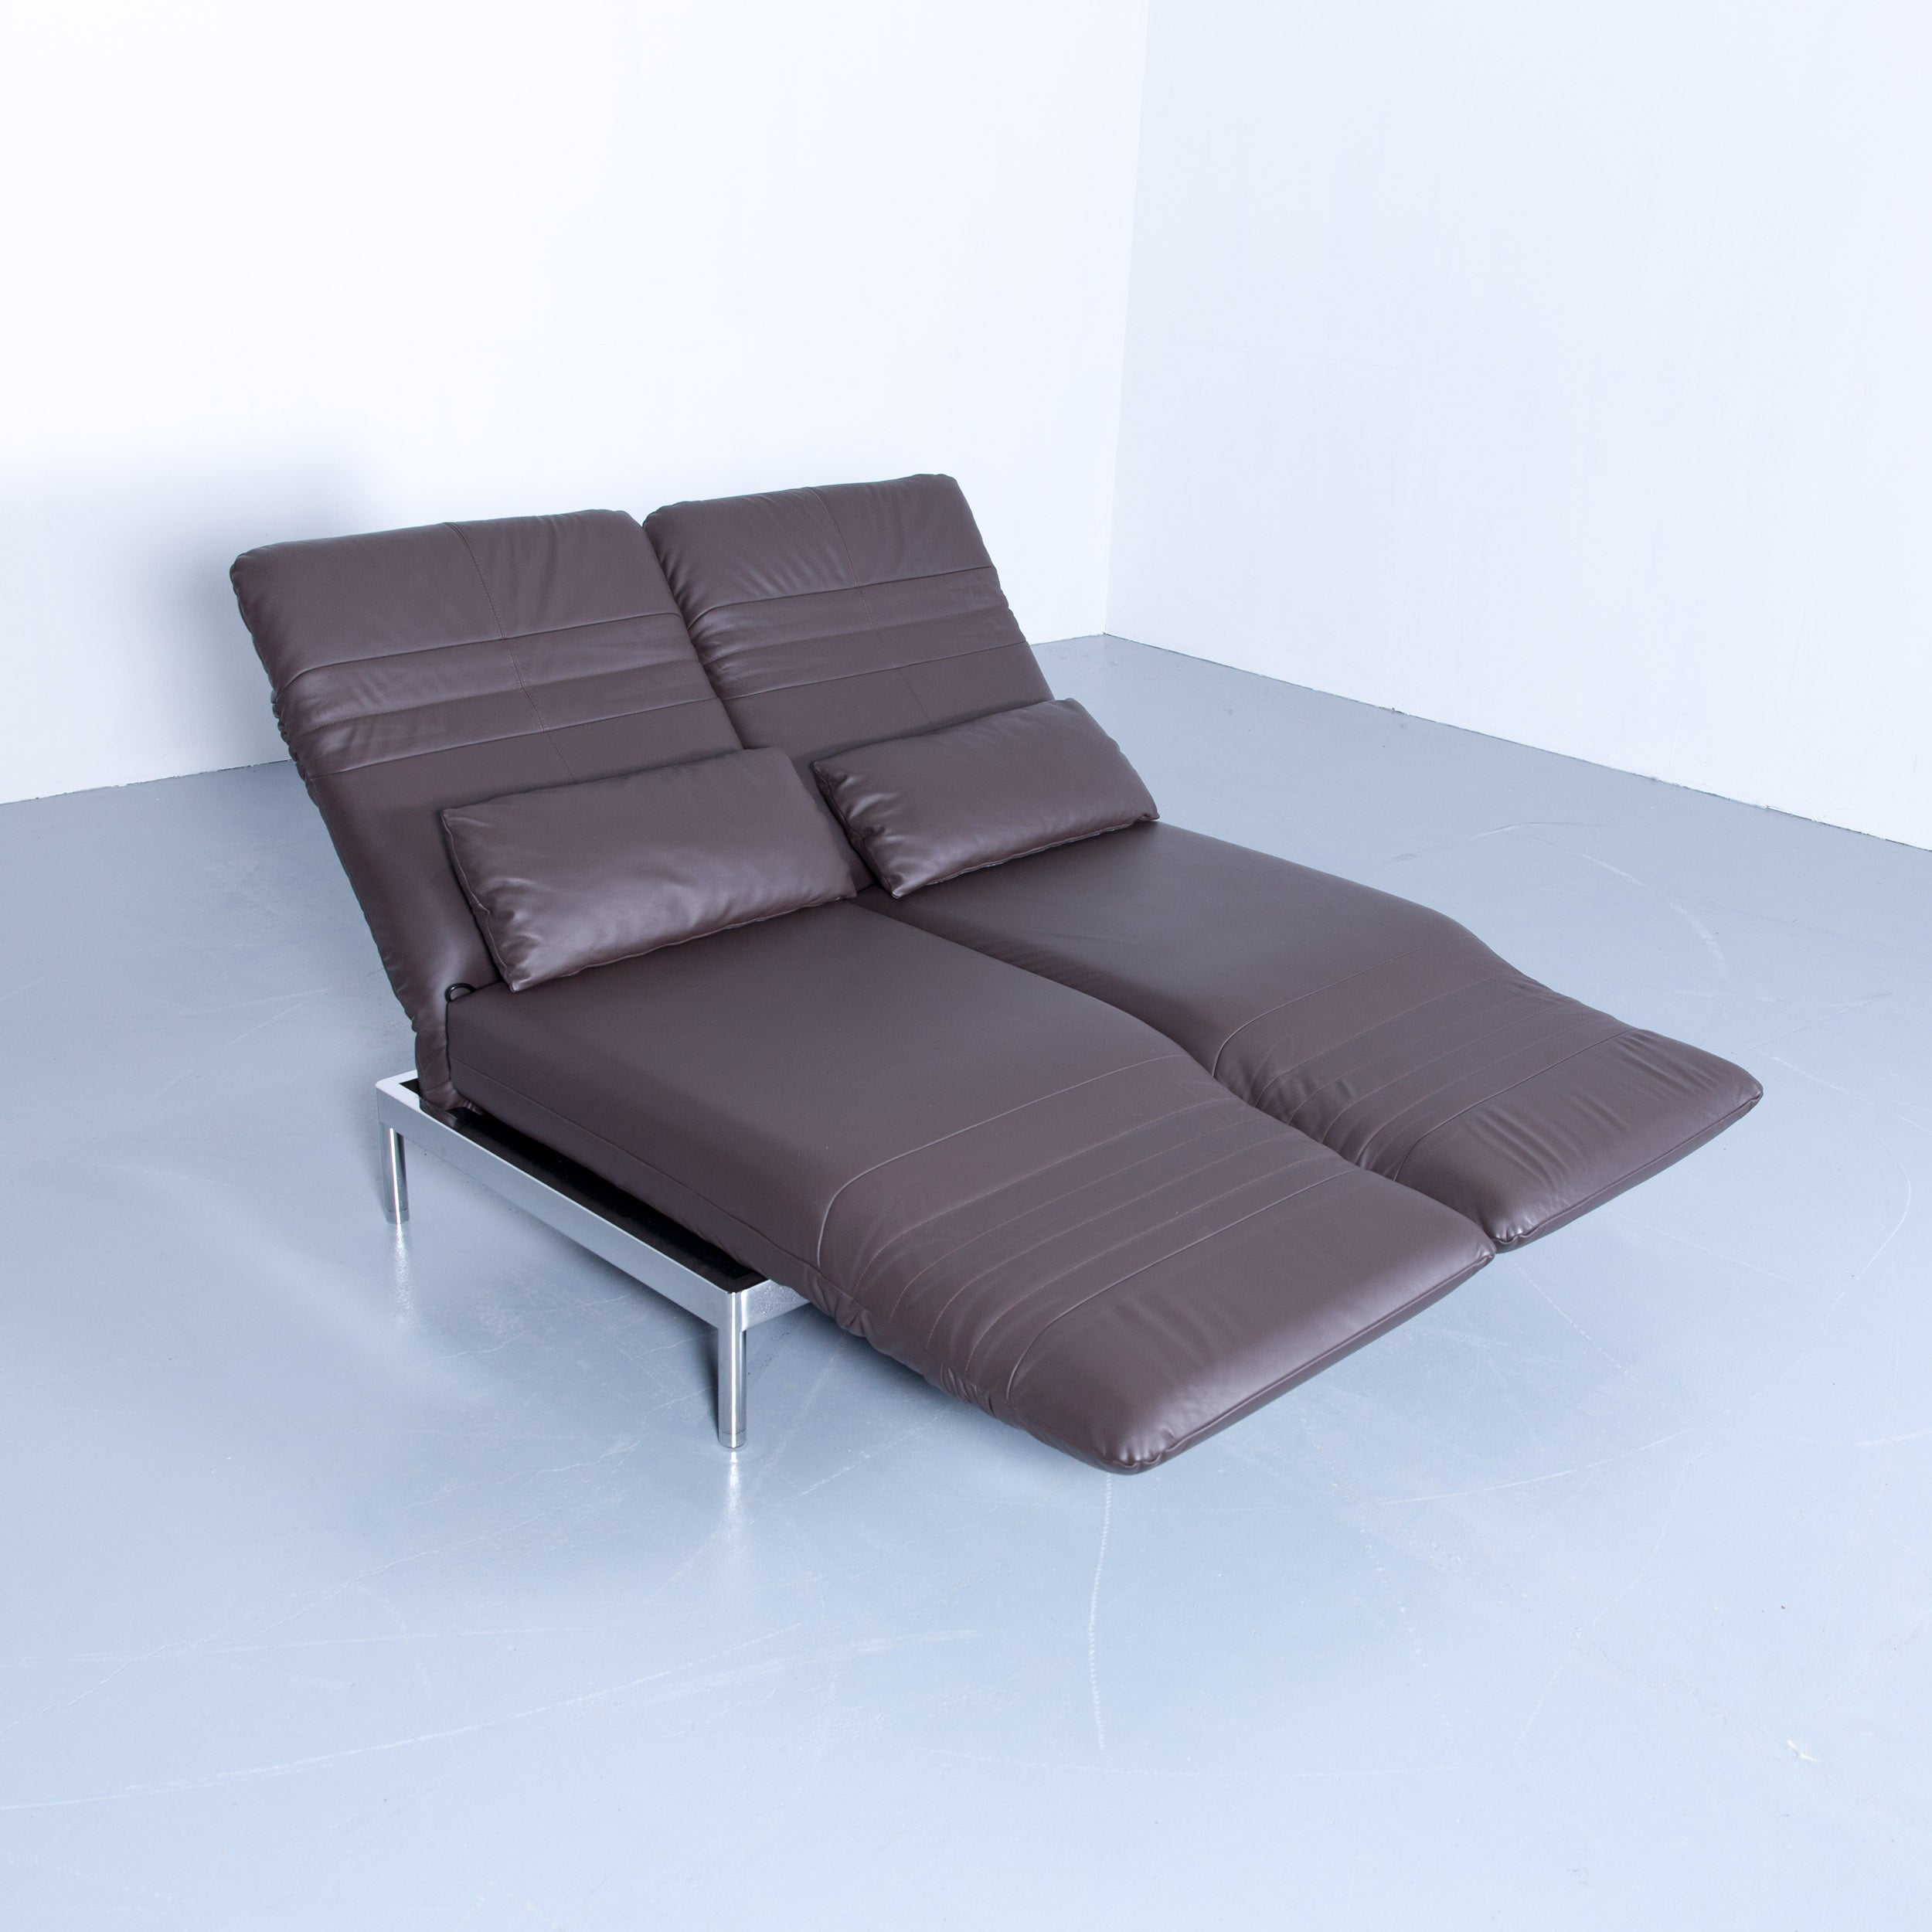 groes ledersofa fabulous cool sofa l form xxl ff von. Black Bedroom Furniture Sets. Home Design Ideas